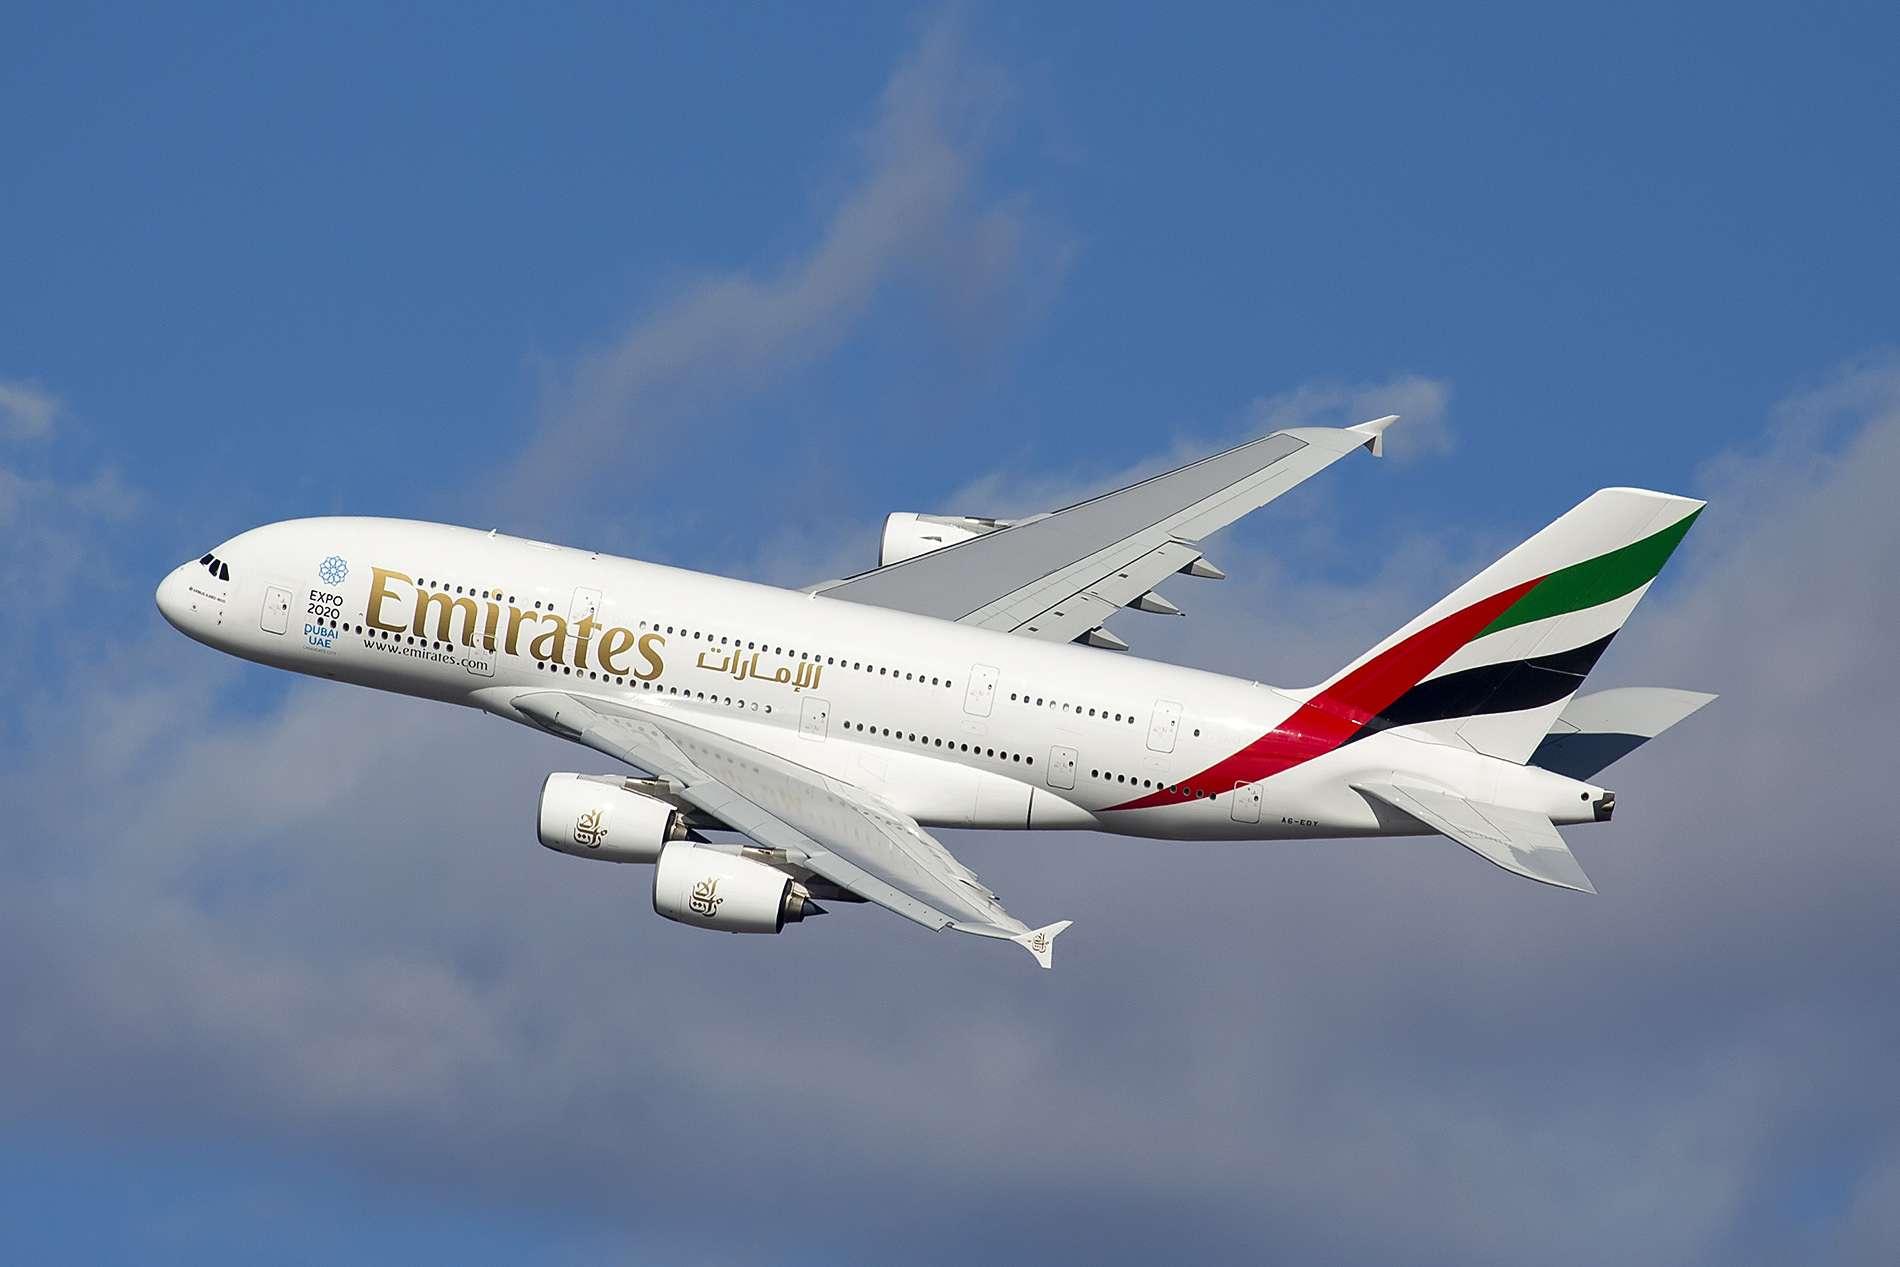 |||Emirates Plane Photo from Maarten Visser and Wikimedia Foundation